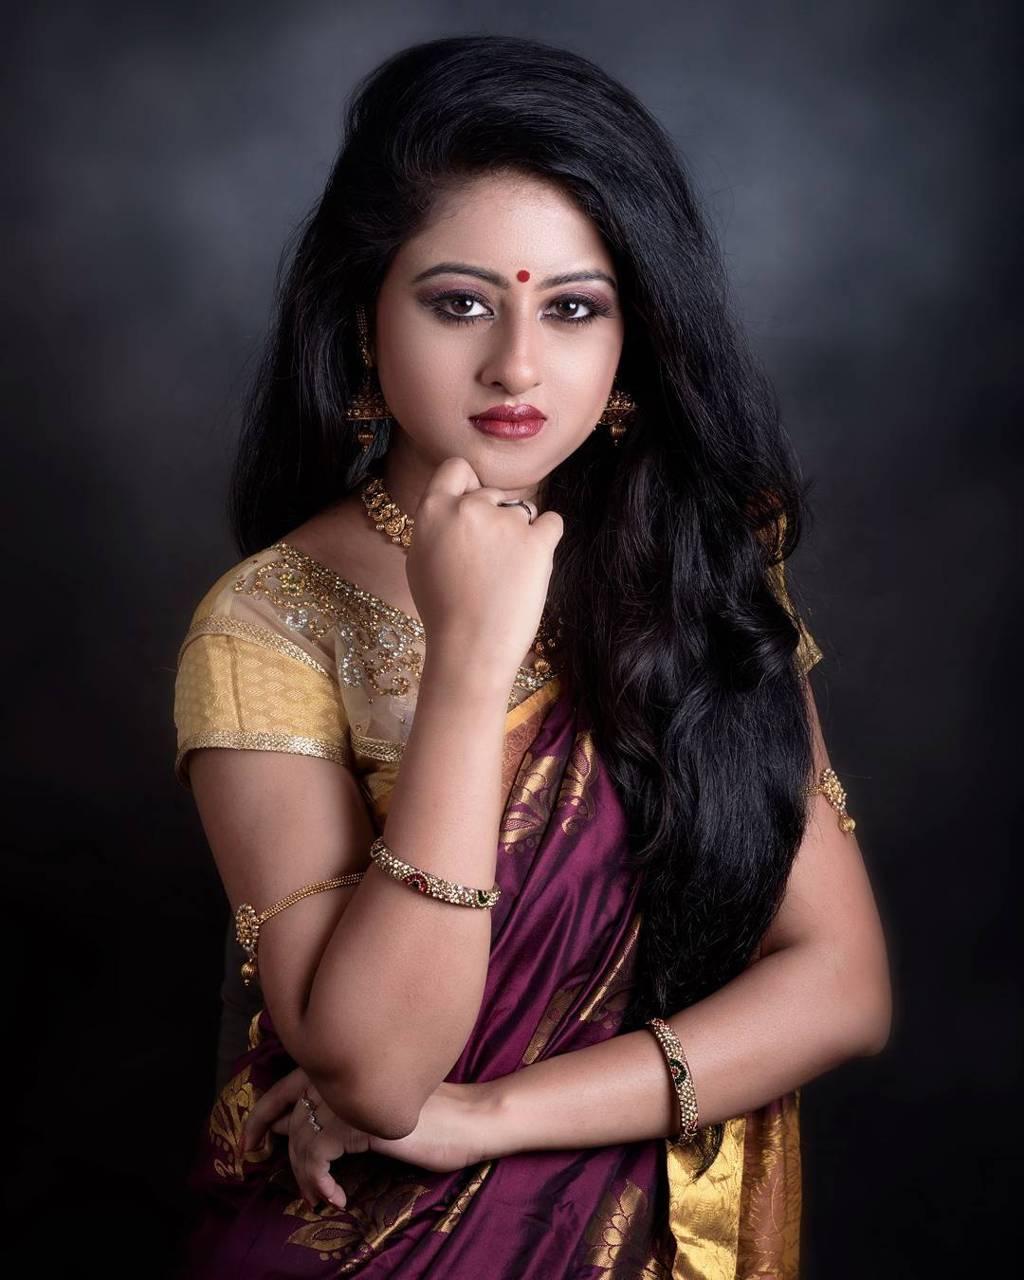 Shilpa Christ